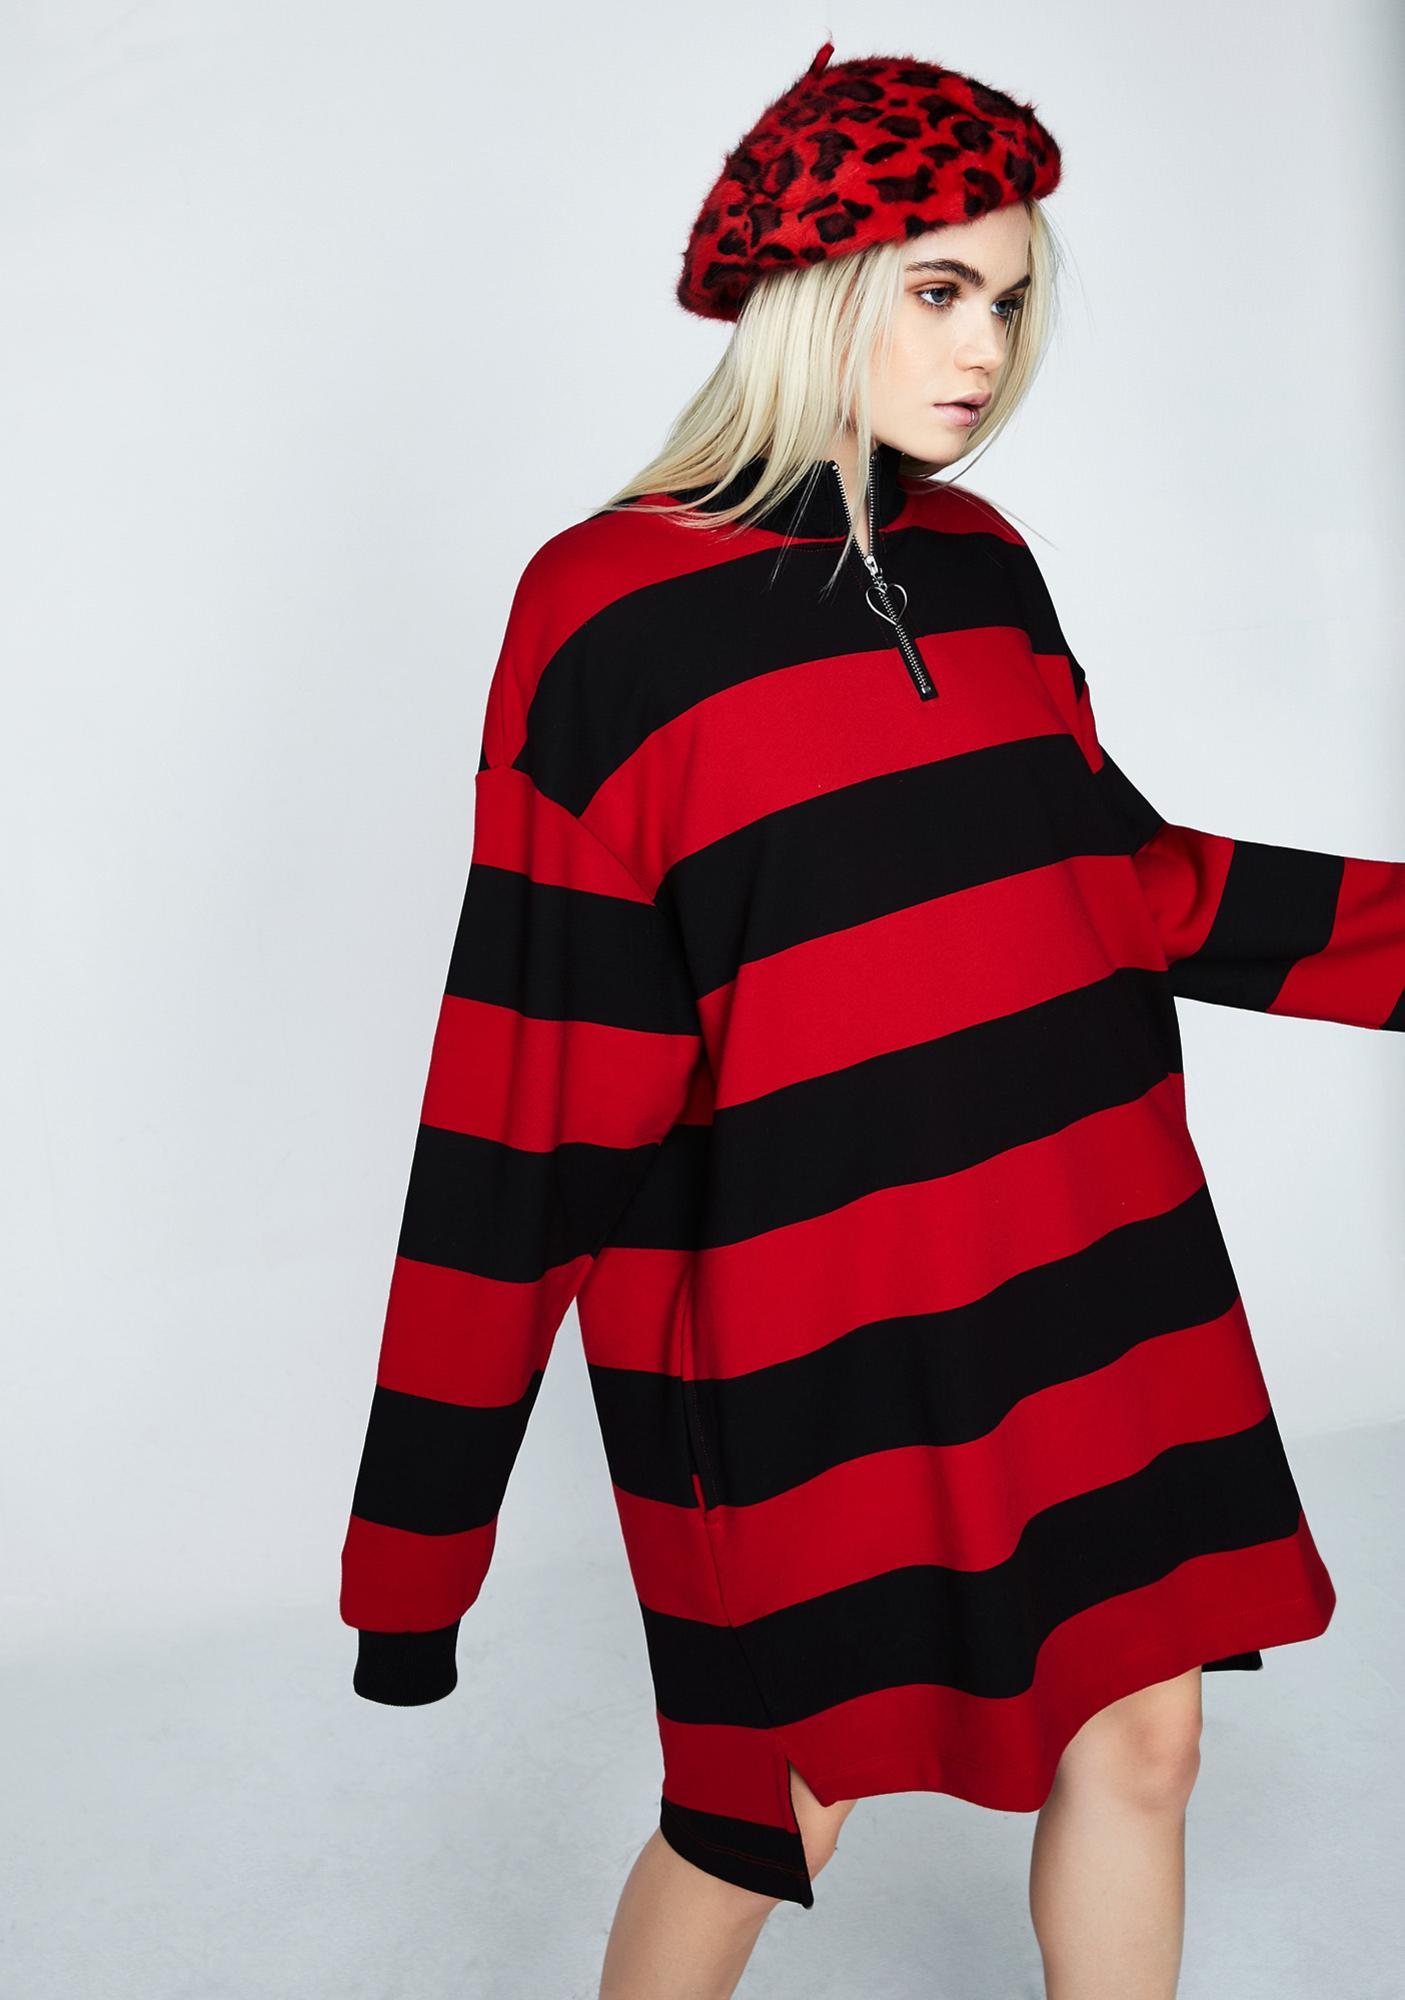 Lazy Oaf Red Menace Sweatshirt